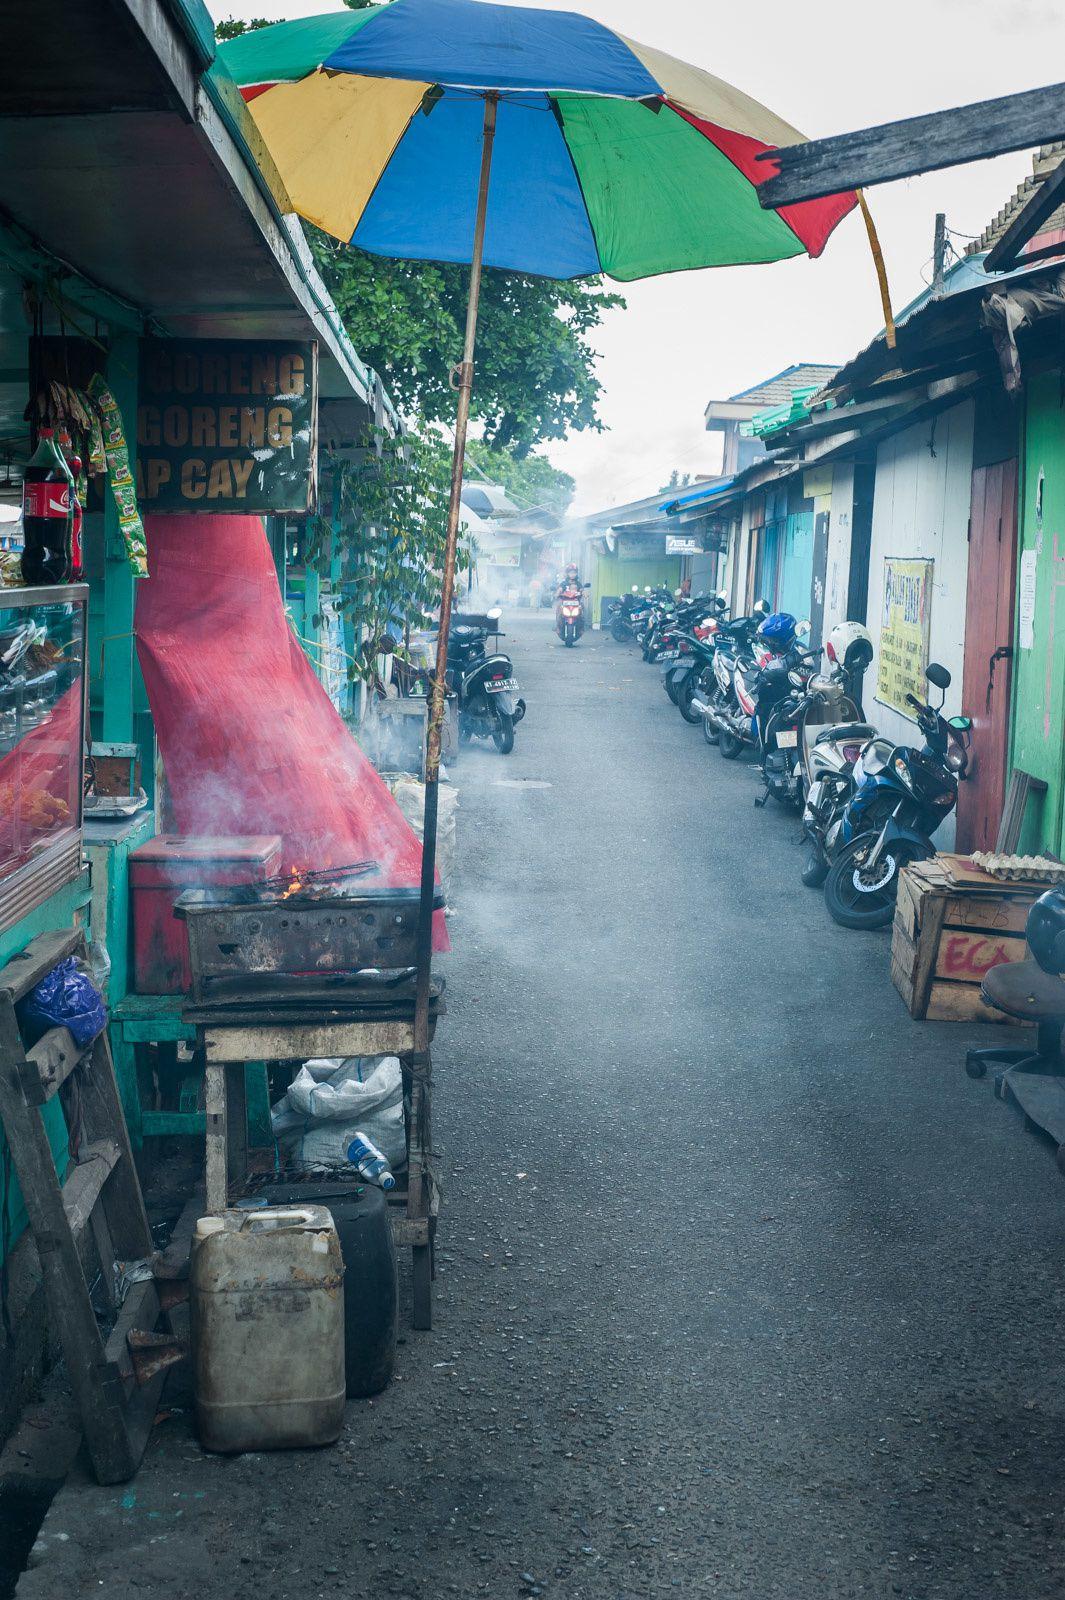 Balikpapan - Klandasan Market - Final Take